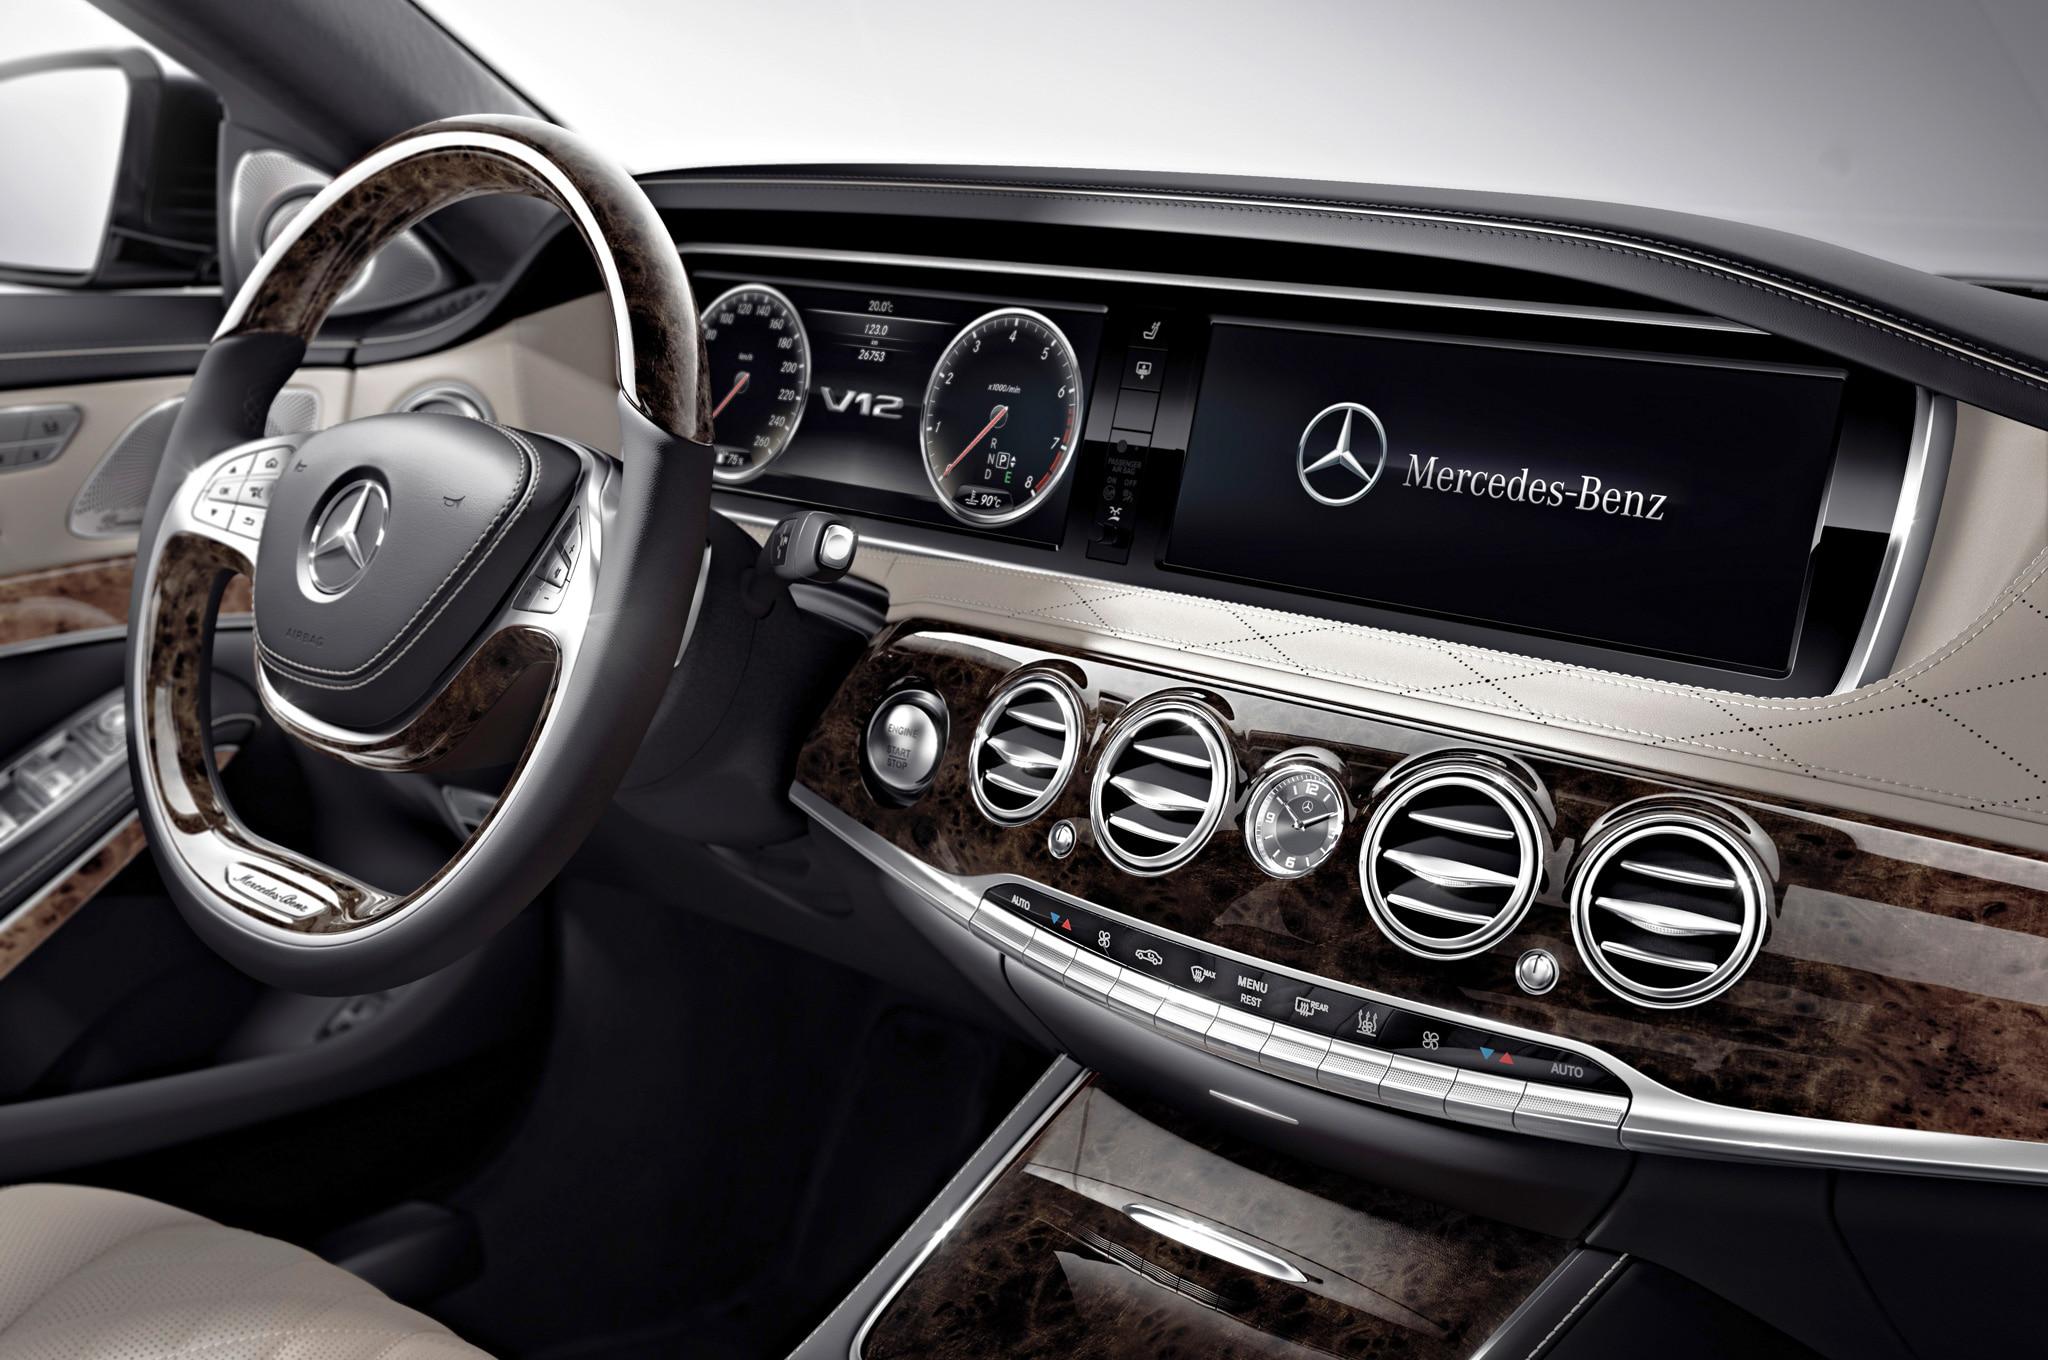 Image gallery mercedes benz 2015 interior for Mercedes benz c class 2015 interior